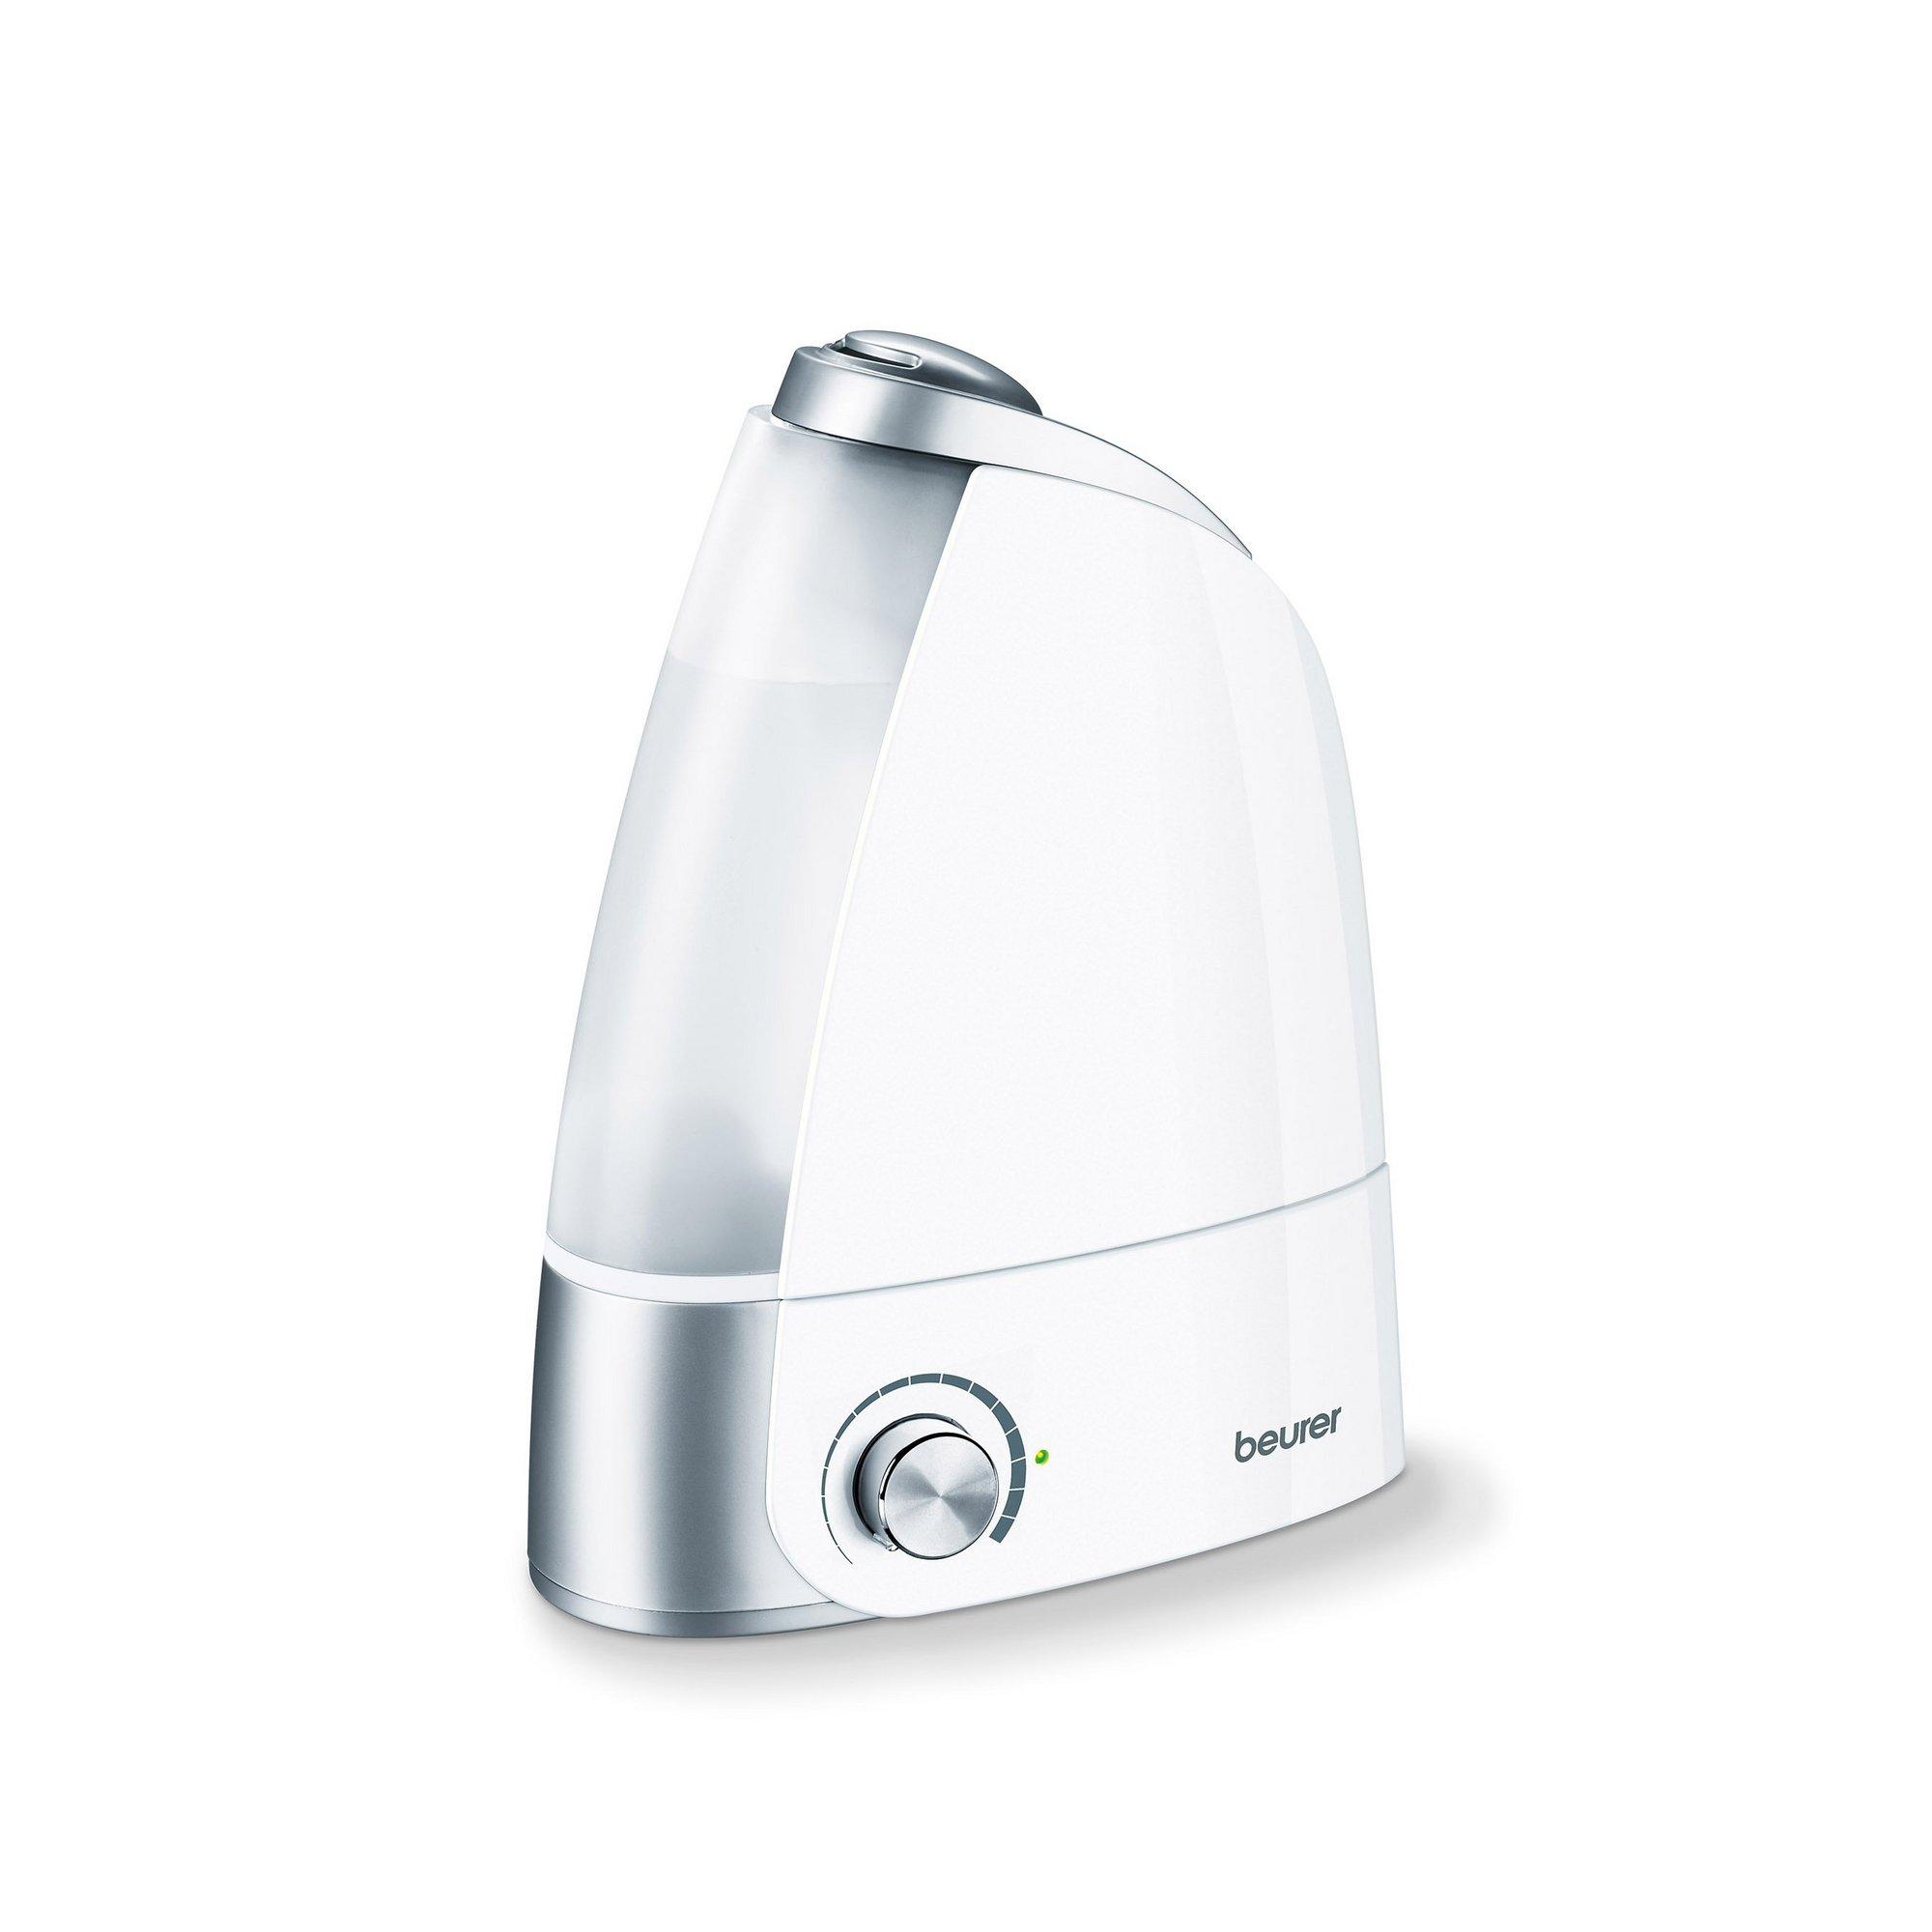 Image of Beurer Ultrasonic Air Mini Humidifier